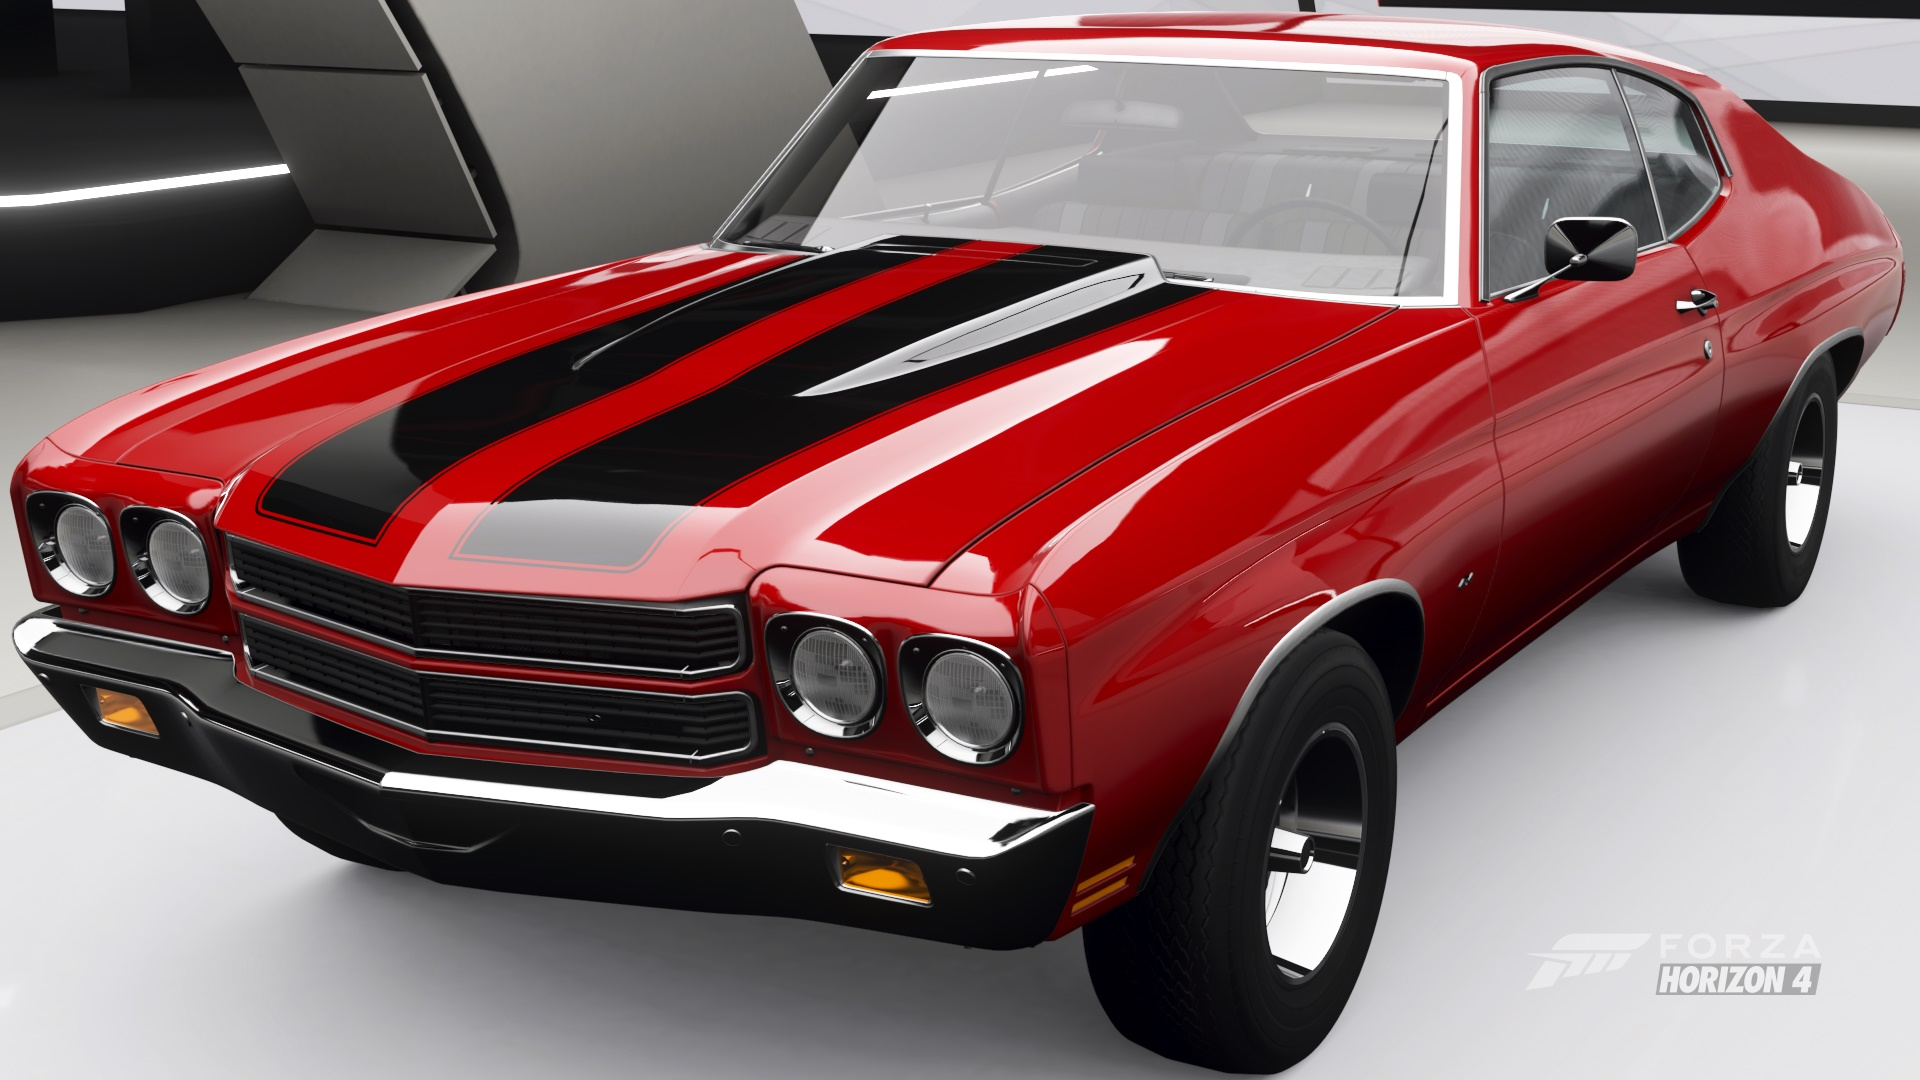 Chevrolet Chevelle Super Sport 454 | Forza Motorsport Wiki | FANDOM